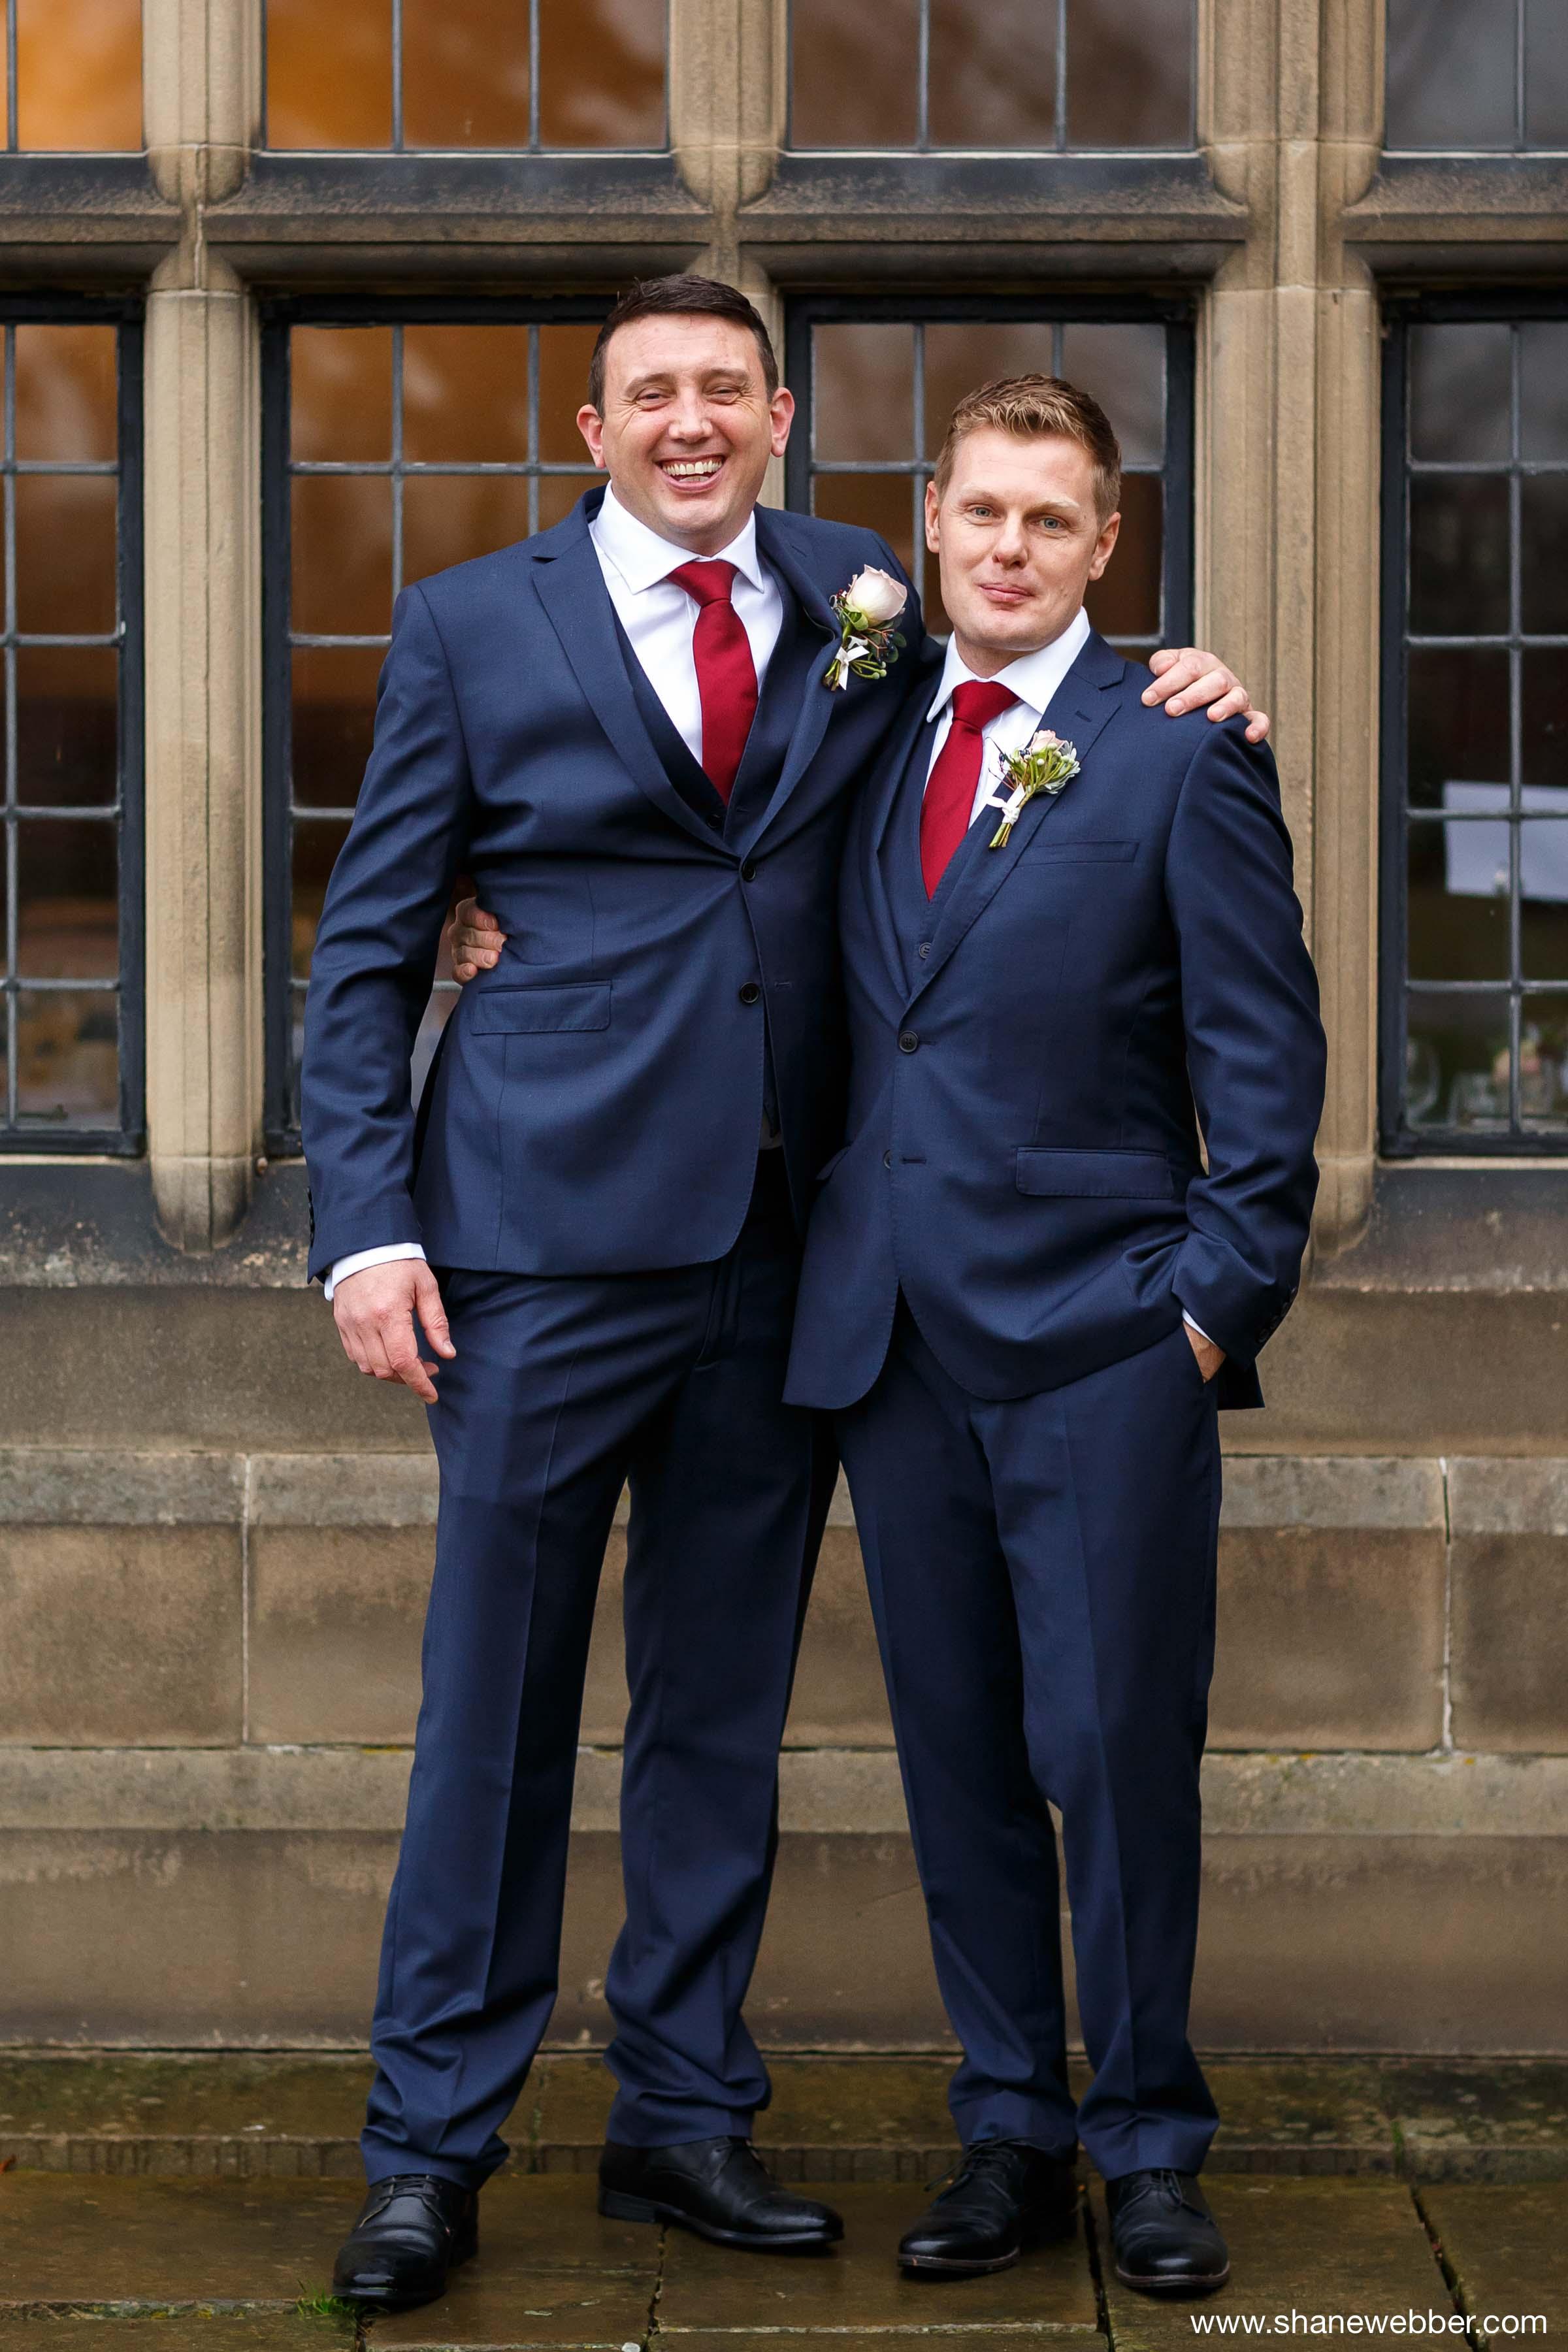 Groomsmen photo at wedding